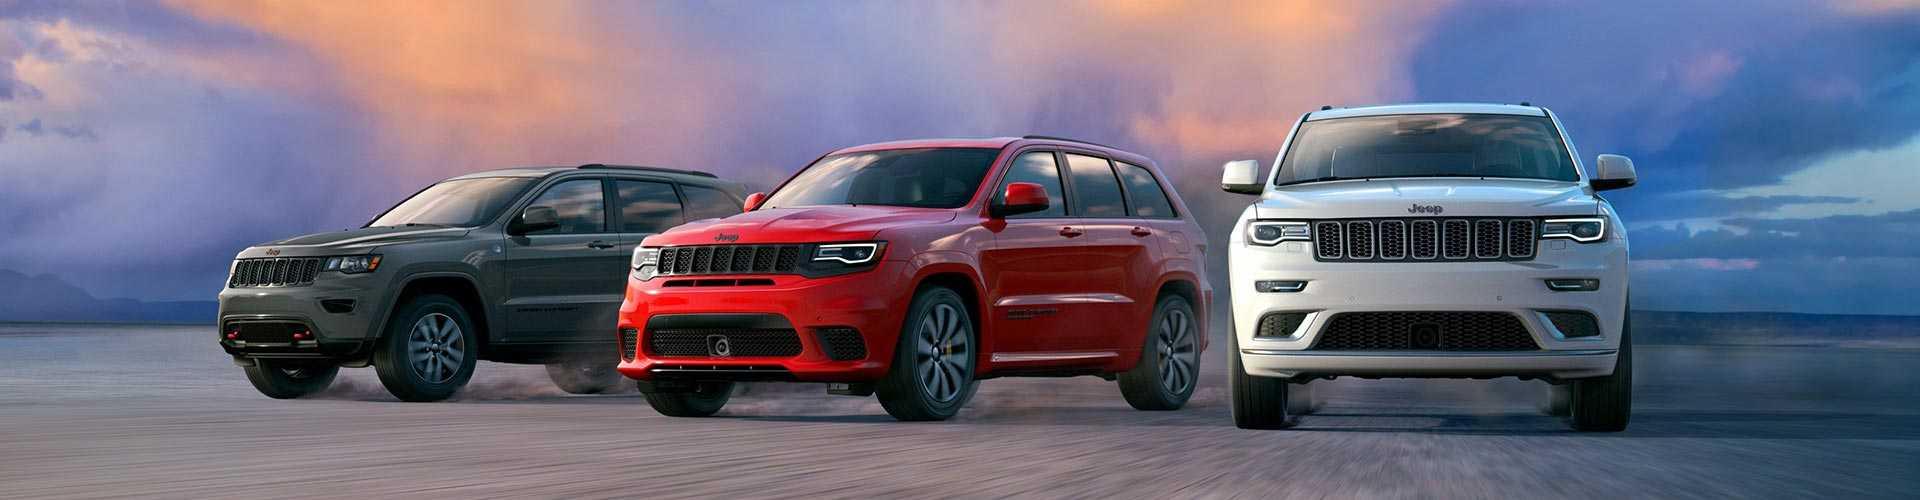 2018 Jeep Grand Cherokee Lease Deals Union County NJ